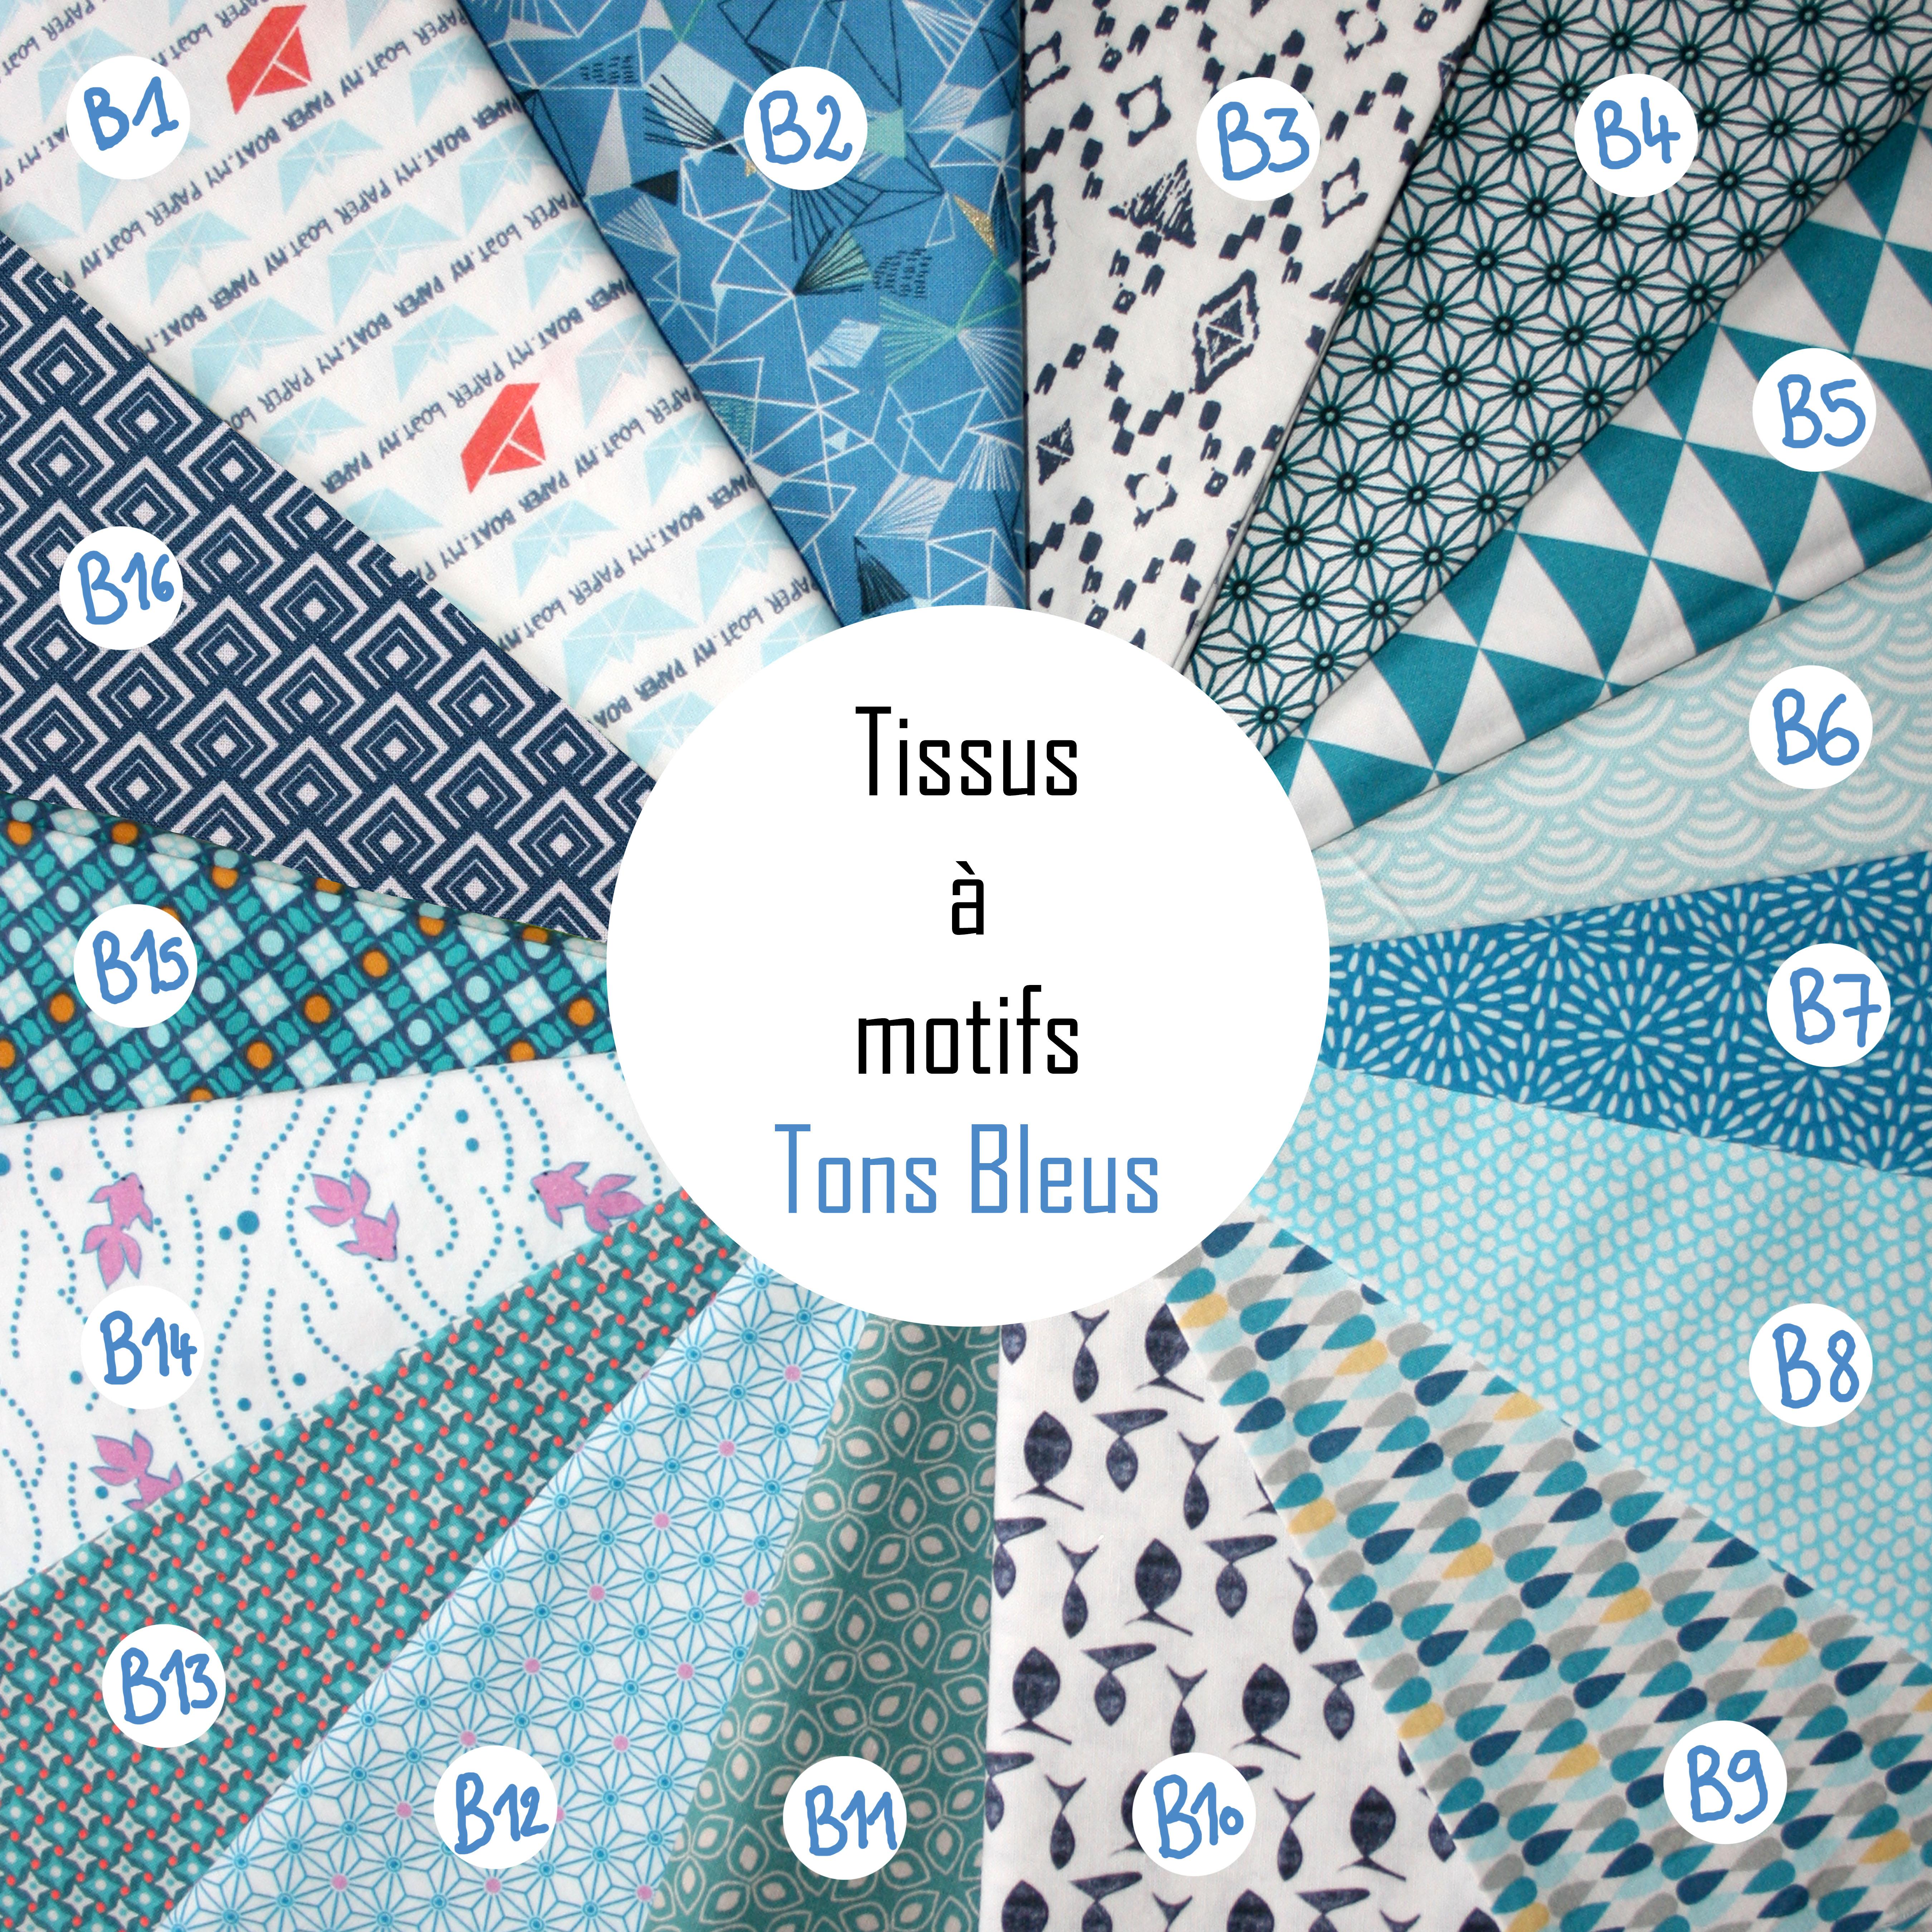 Motifs Tons Bleus